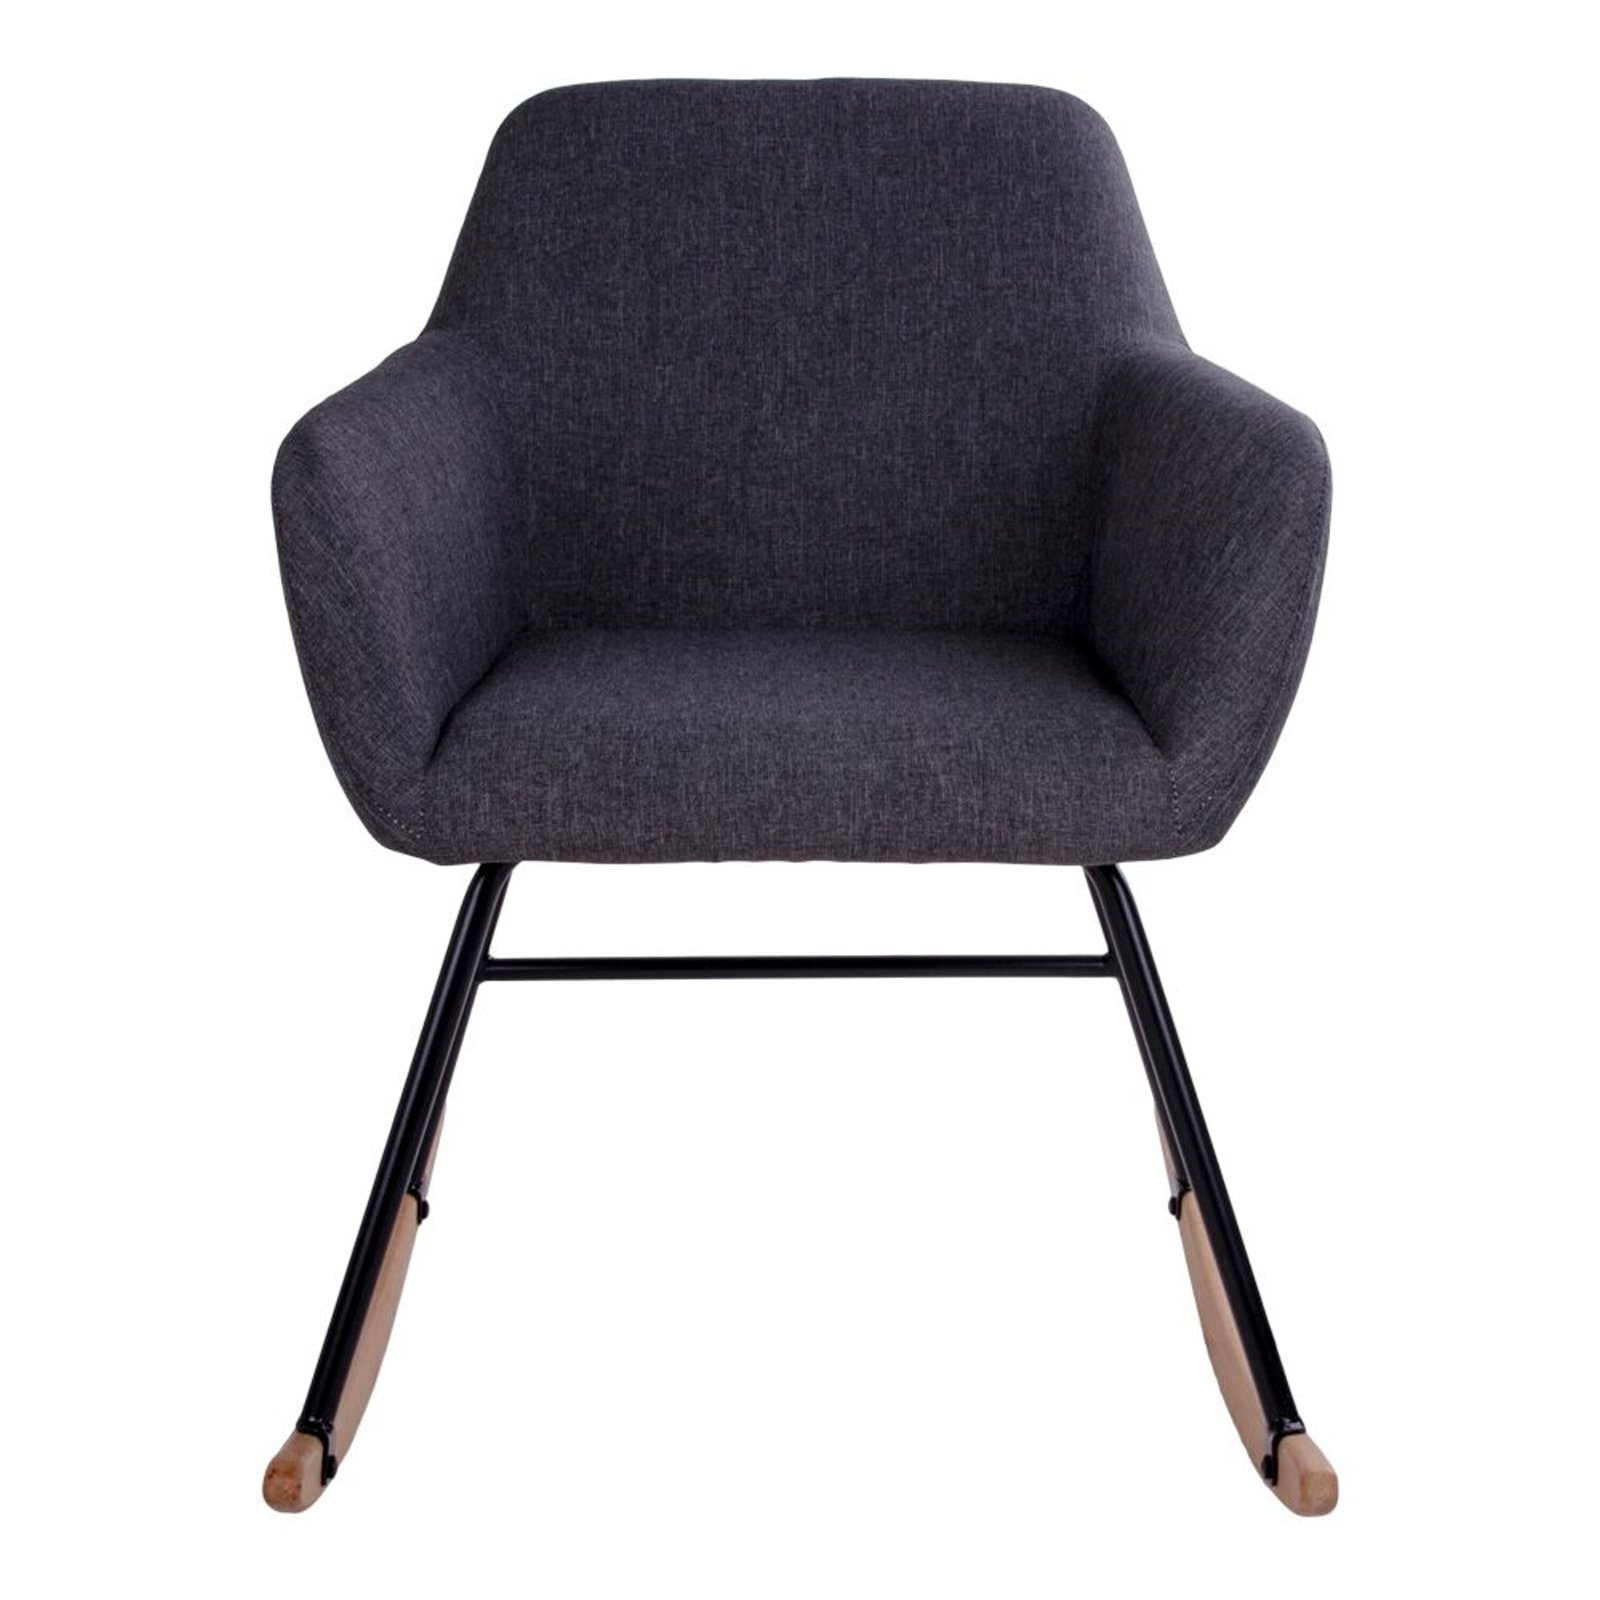 pkline schaukelstuhl yma in grau stuhl sessel schwingstuhl relaxstuhl m bel wohnen st hle hocker. Black Bedroom Furniture Sets. Home Design Ideas